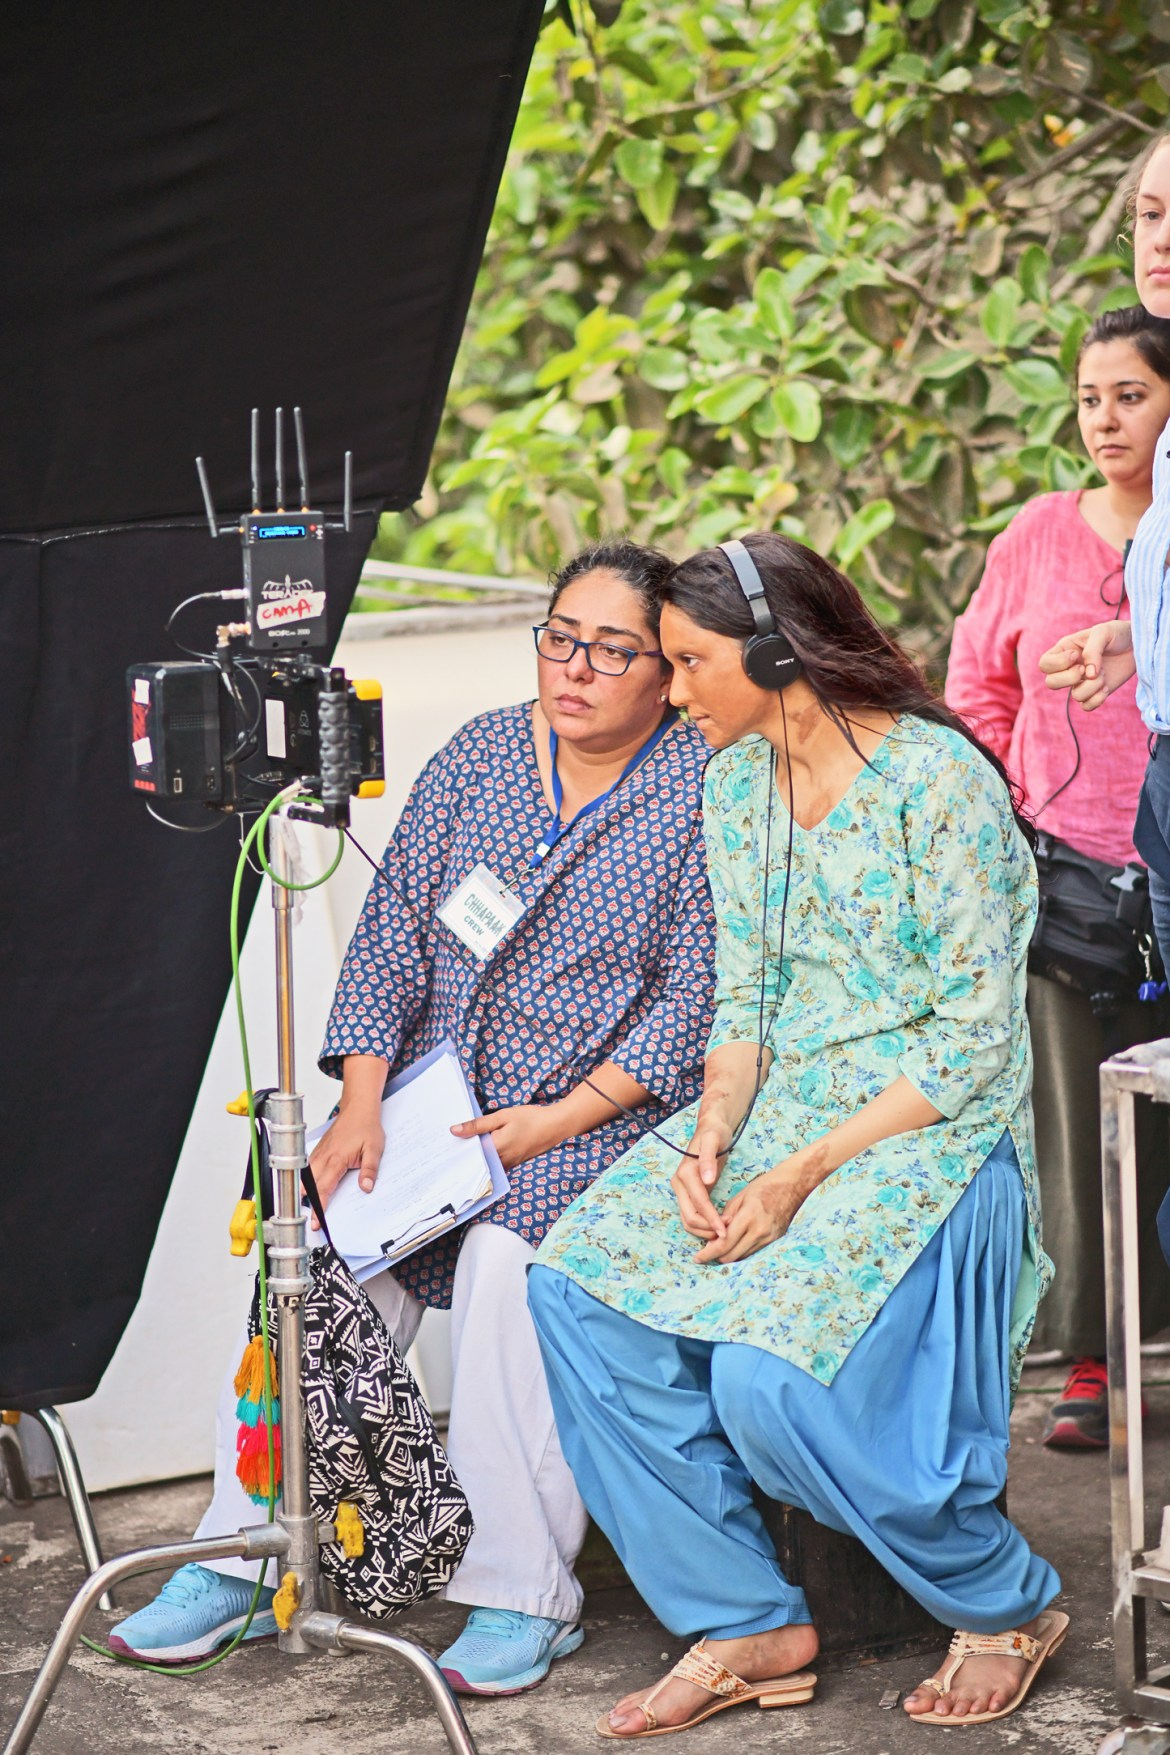 Director Meghna Gulzar and actor Deepika Padukone on the set of Chhapaak